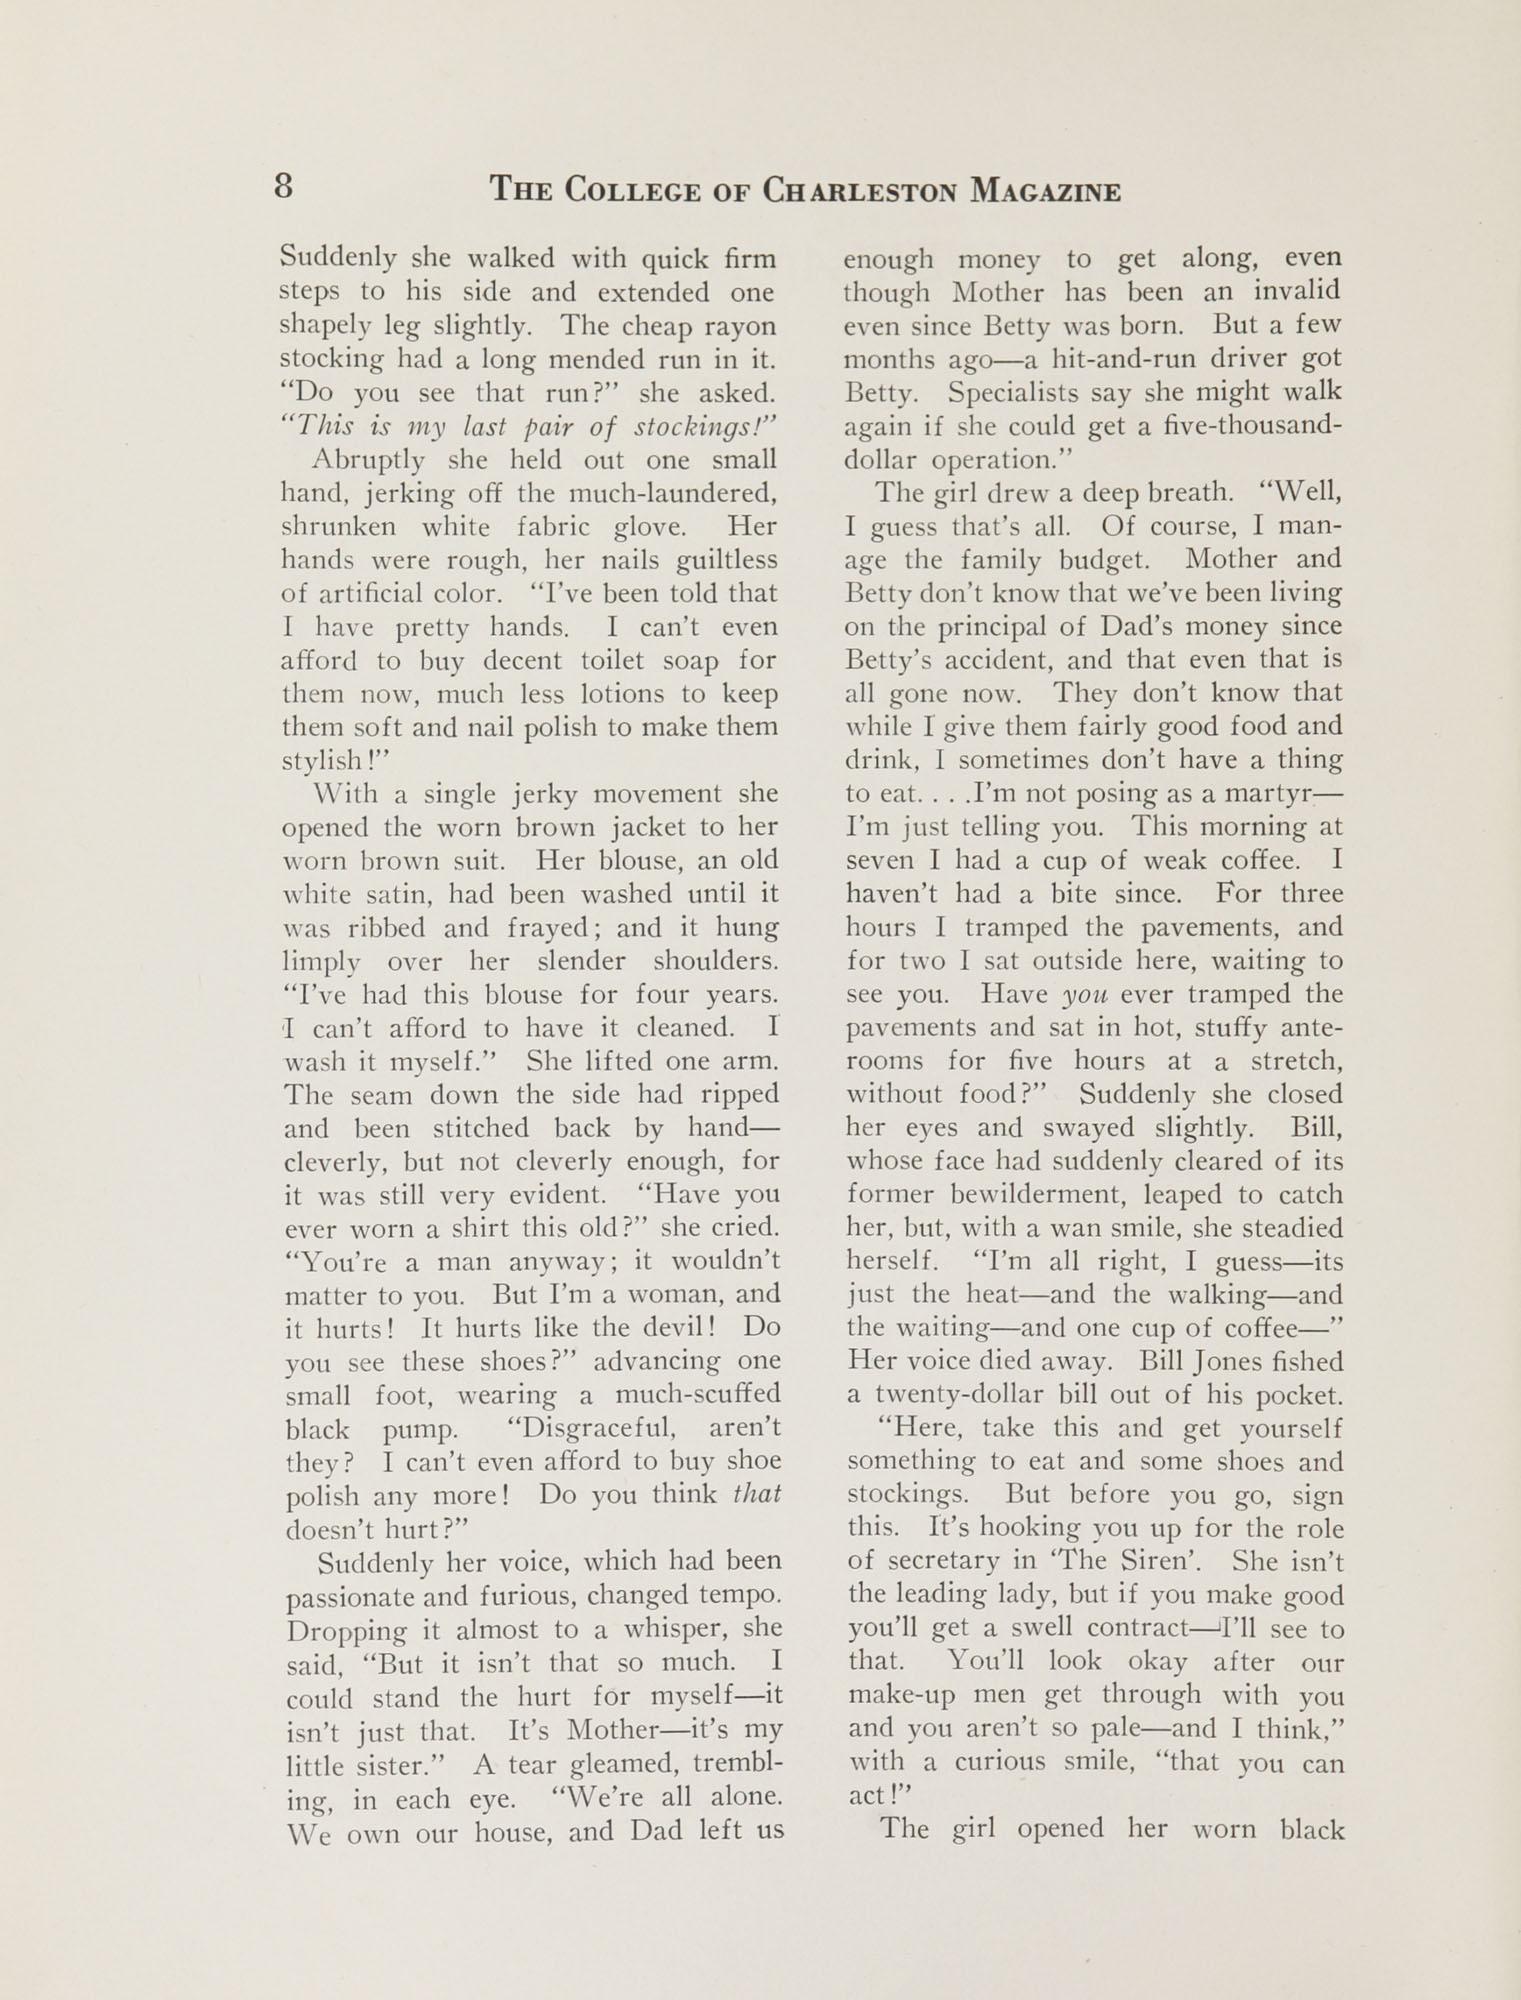 College of Charleston Magazine, 1937-1938, Vol. XXXXI No. 1, page 8